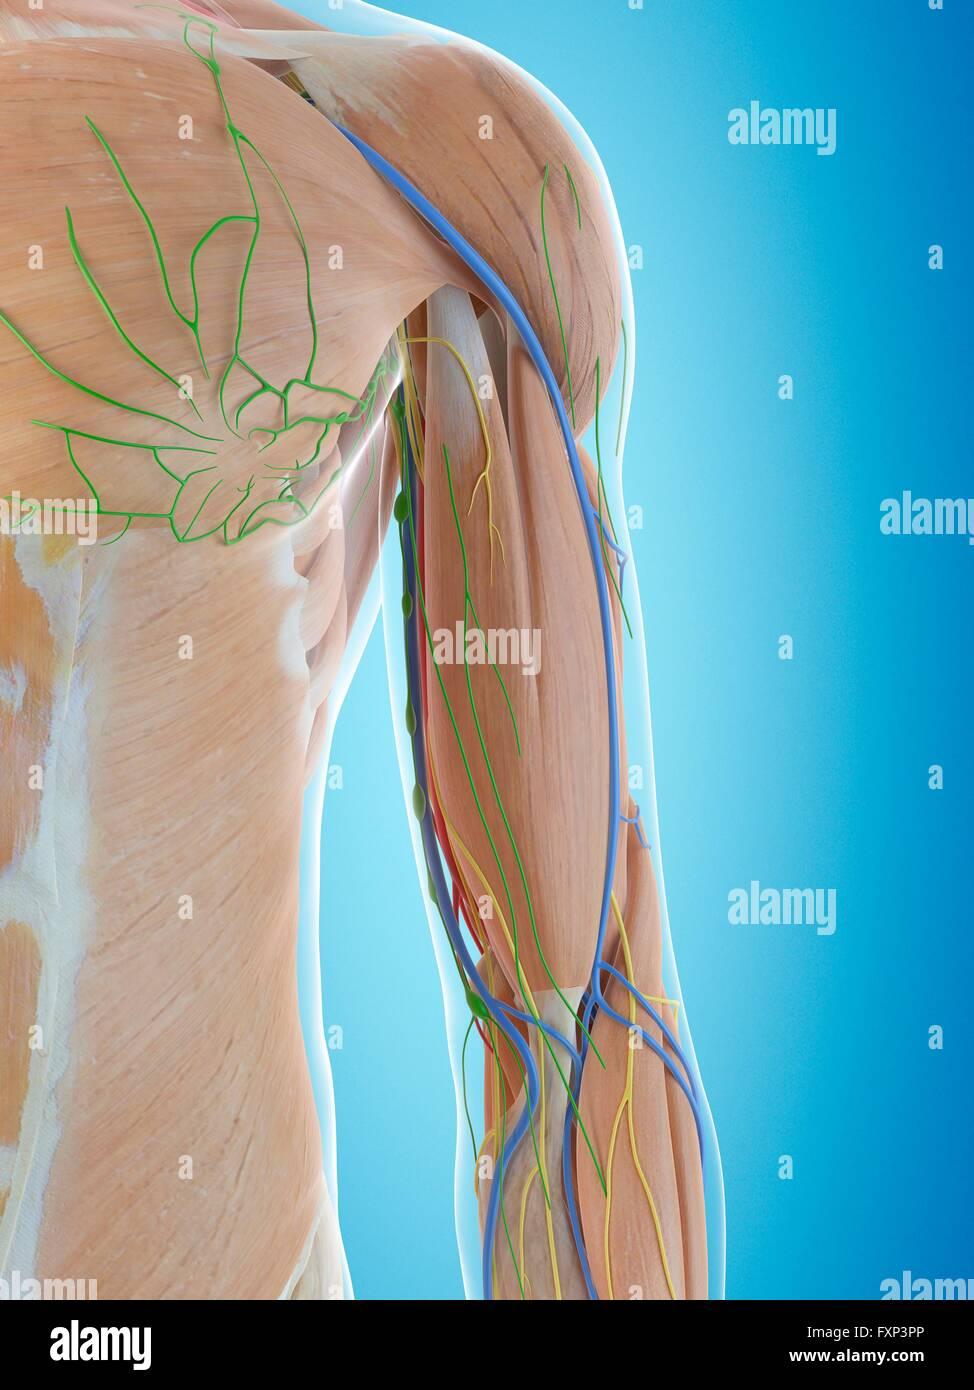 Arm Arteries Stockfotos & Arm Arteries Bilder - Alamy